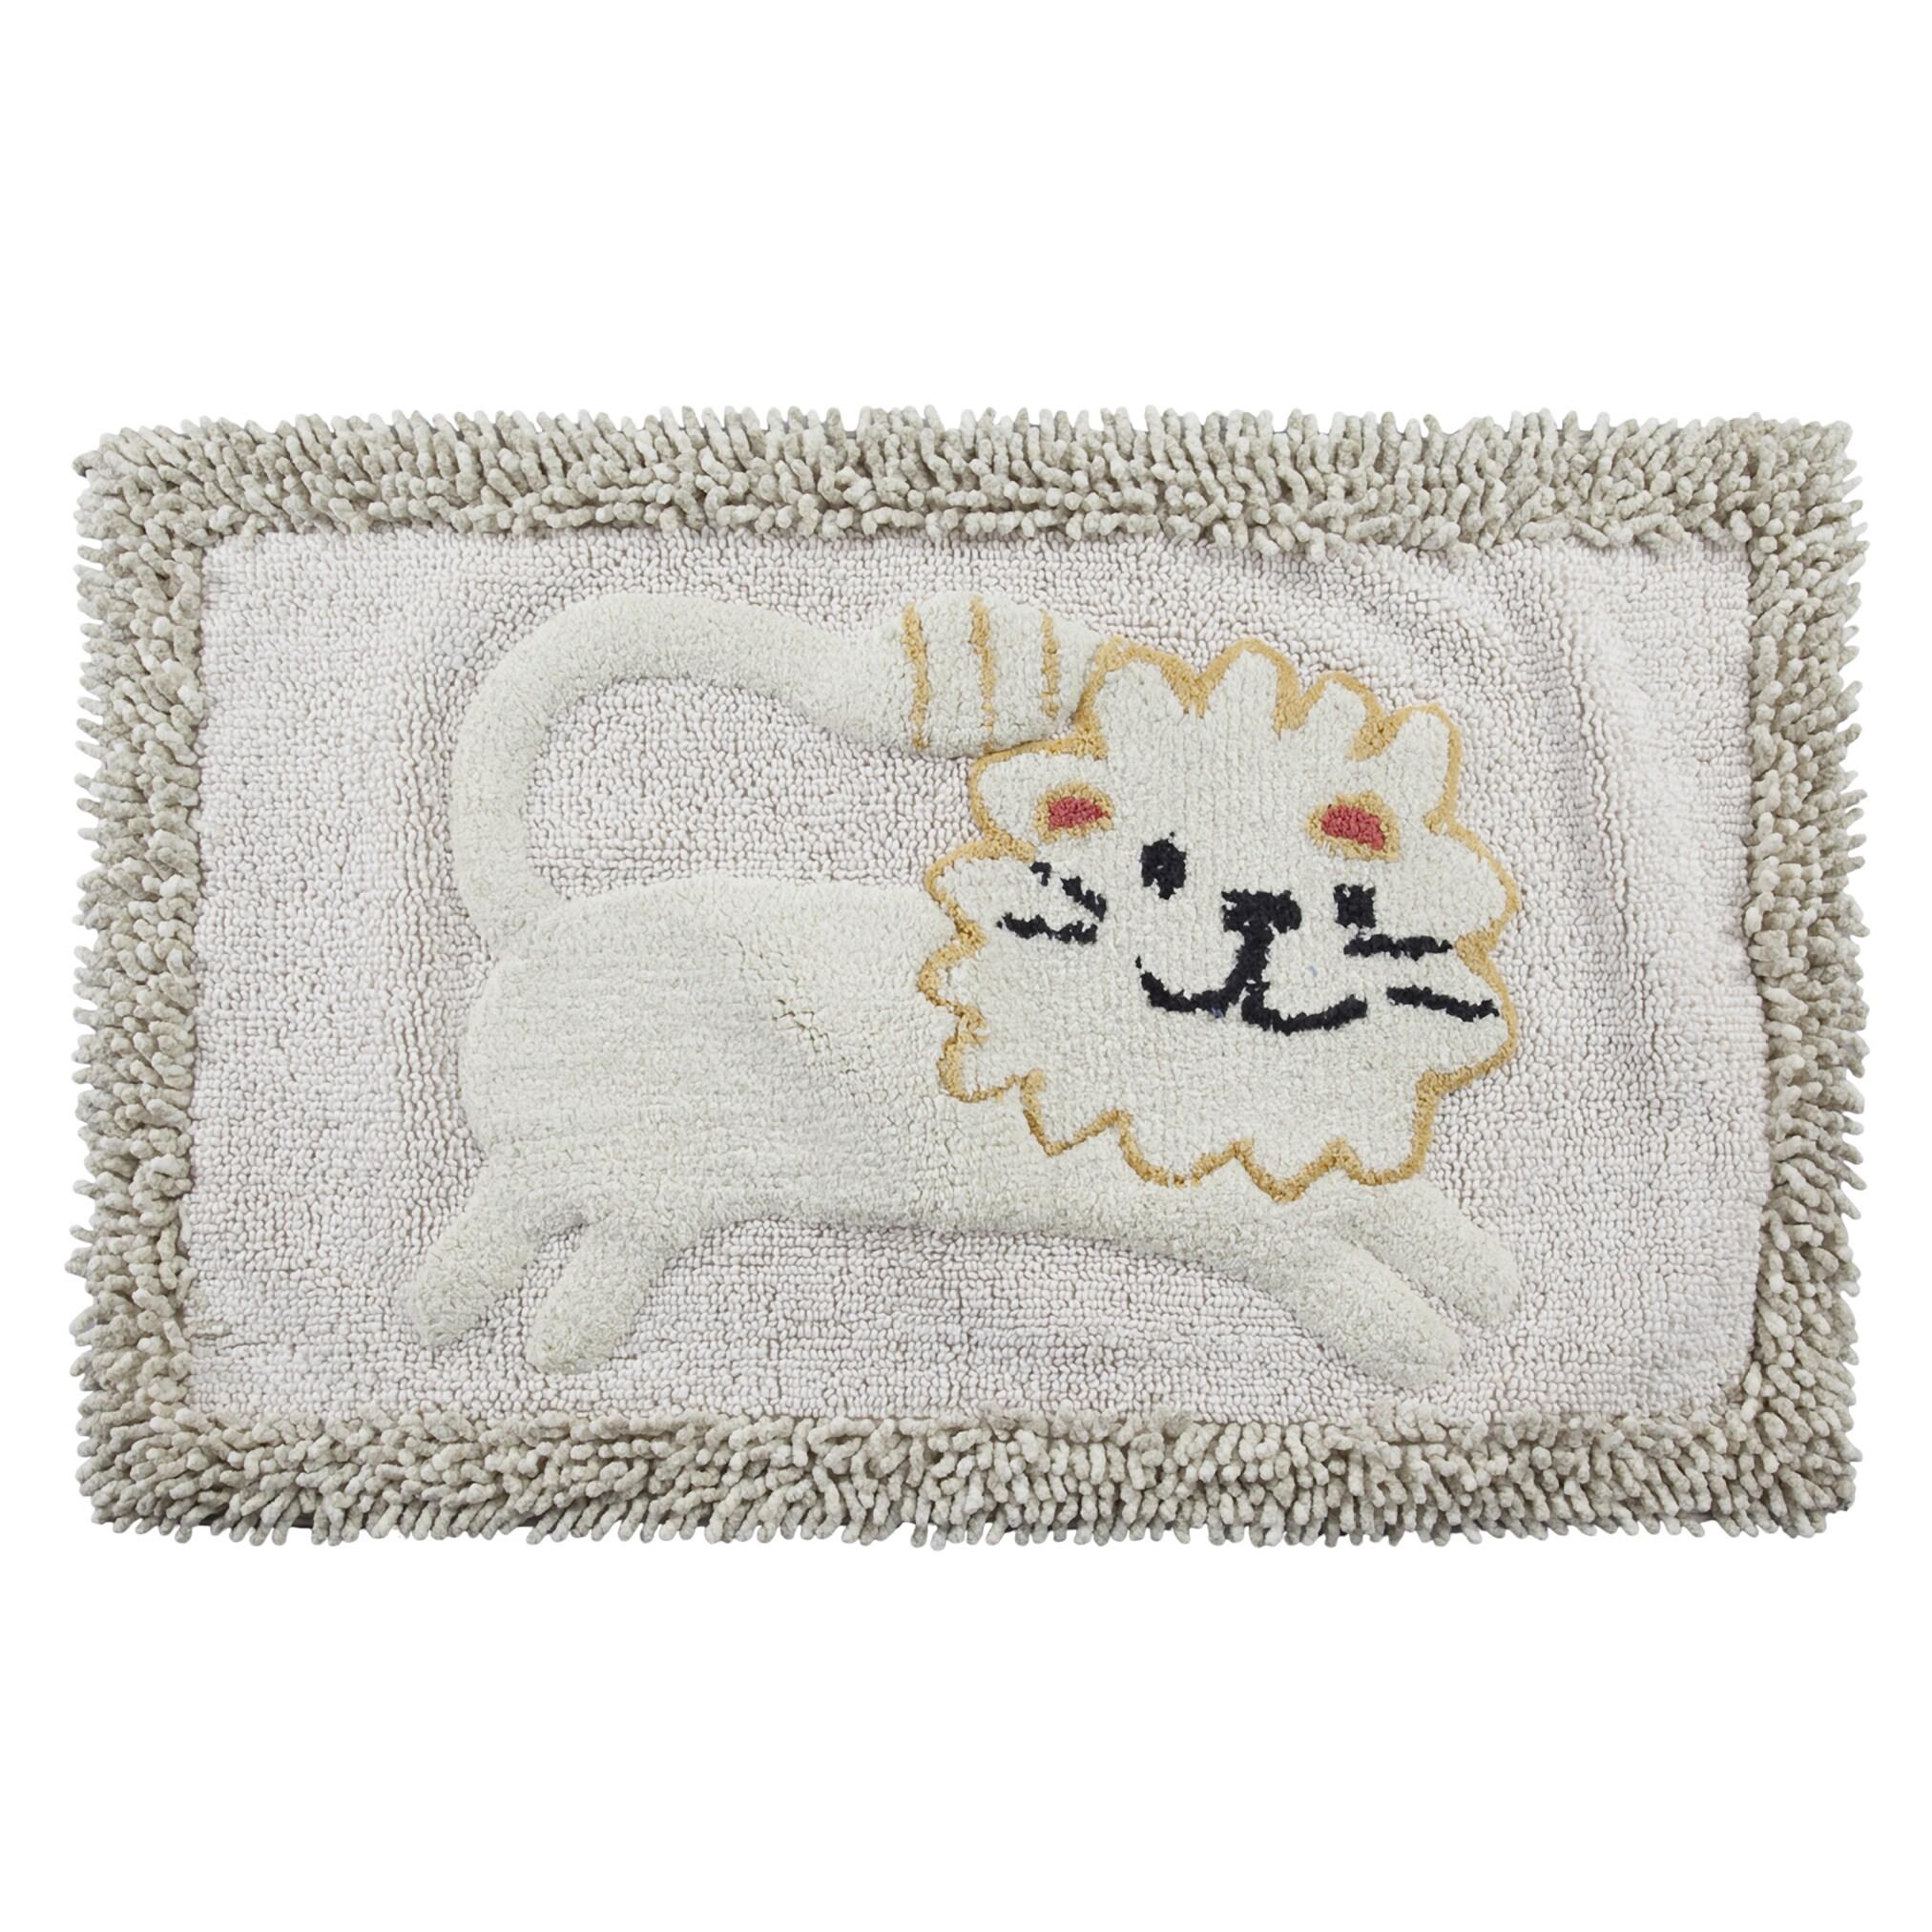 Creative Animal Crackers Bathroom Set (bath rug), White (...